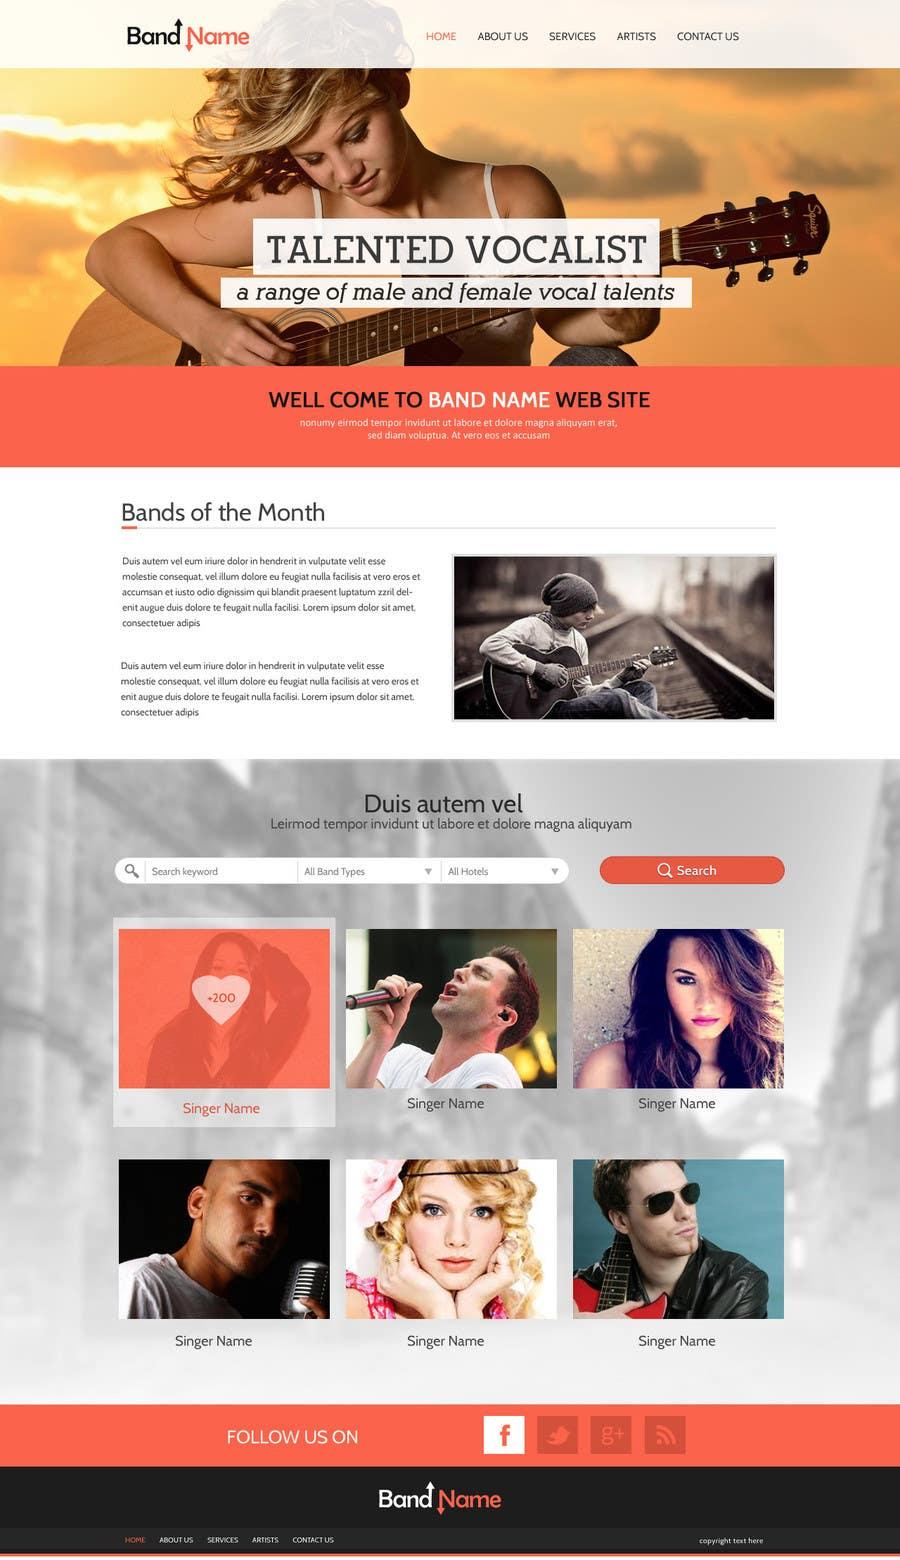 Bài tham dự cuộc thi #10 cho Design a Website for Music Band introduction site